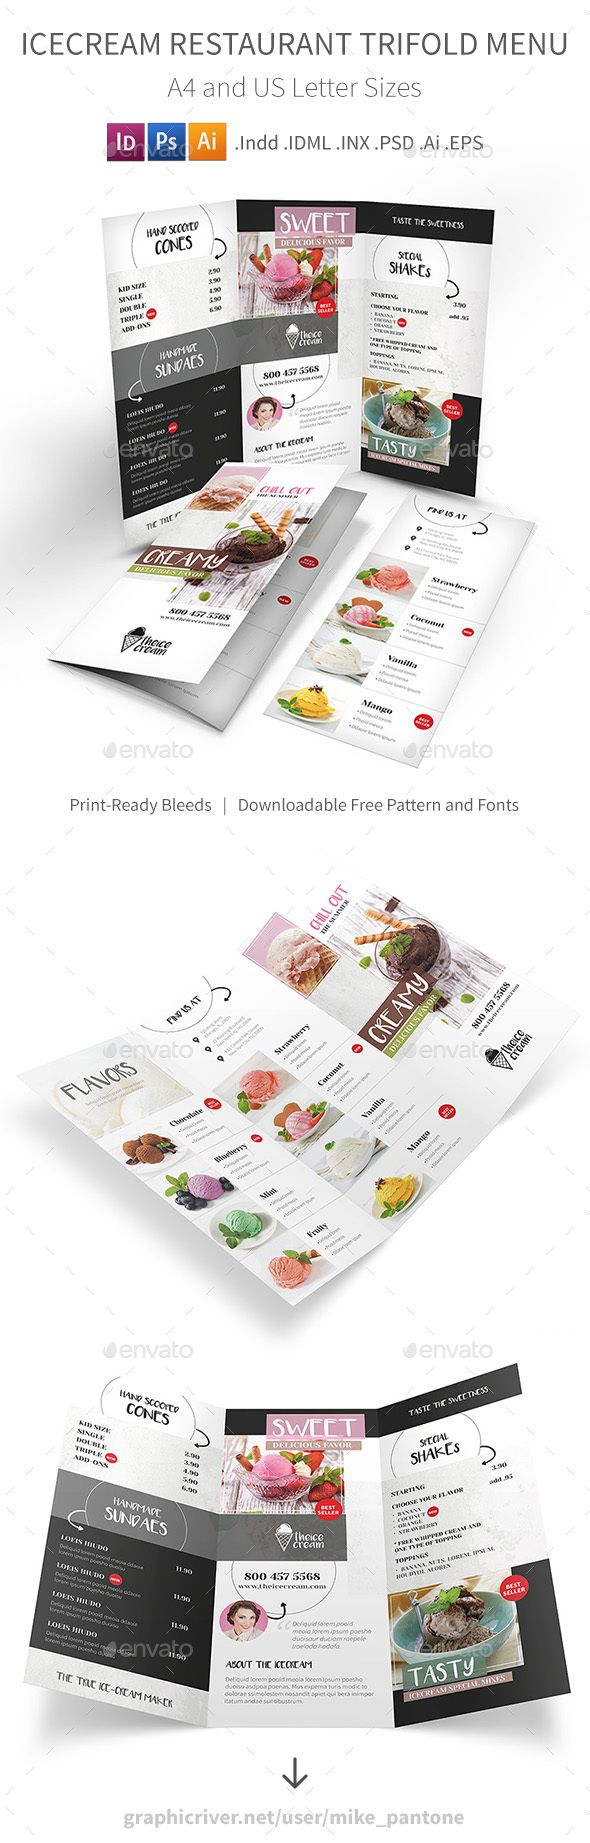 Ice Cream Restaurant Trifold Menu - Food Menus Print Templates Download here : https://graphicriver.net/item/ice-cream-restaurant-trifold-menu/18951425?s_rank=134&ref=Al-fatih